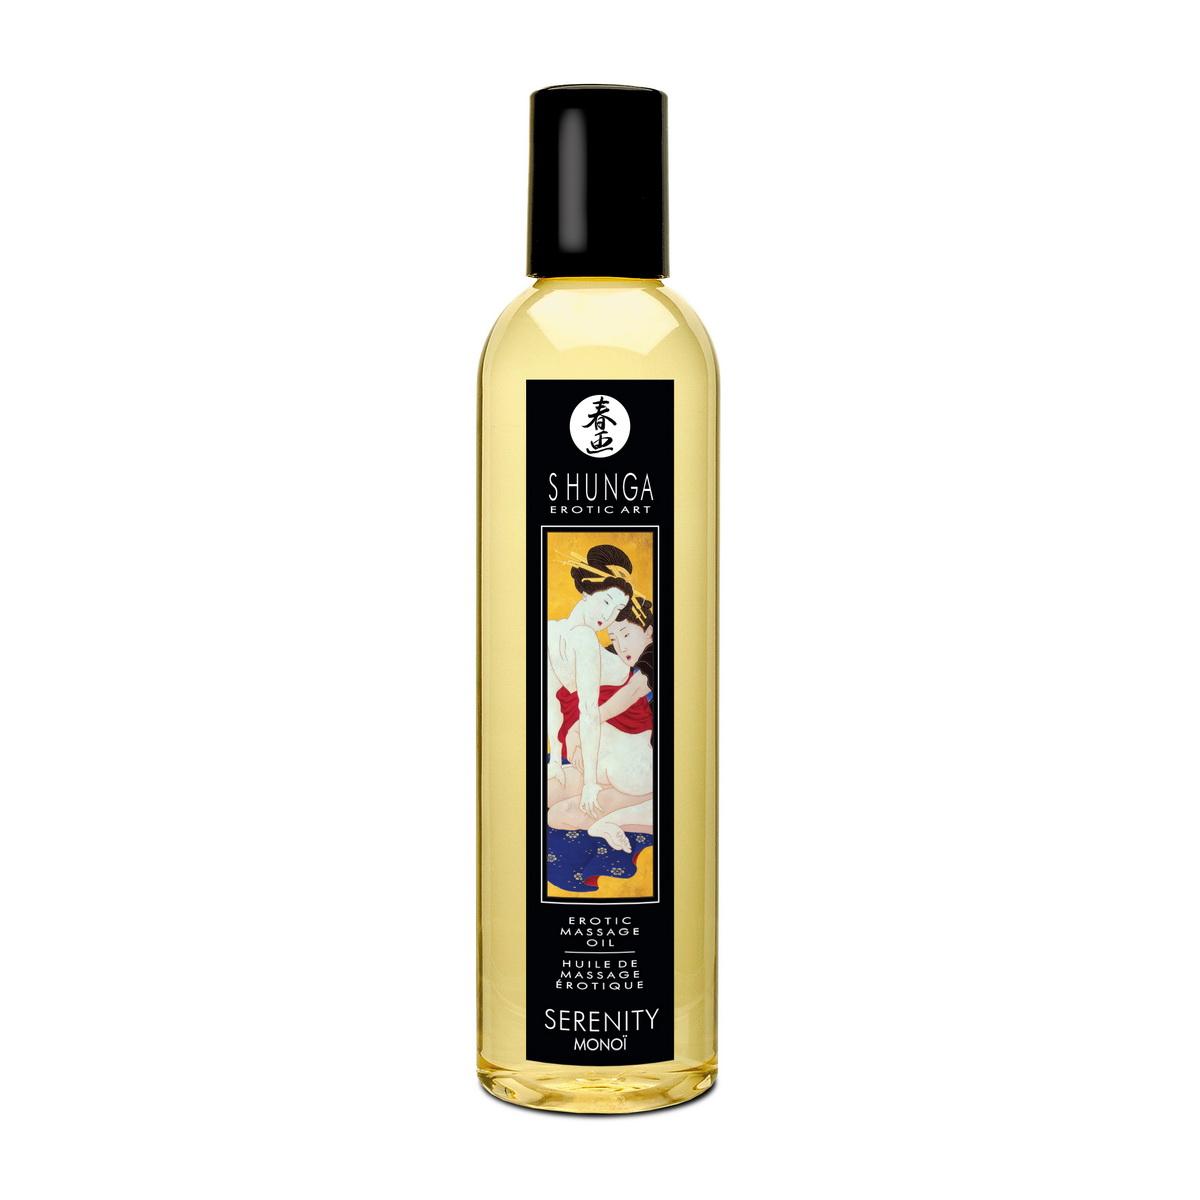 Erotický masážní olej Serenity Monoi Shunga (250 ml)